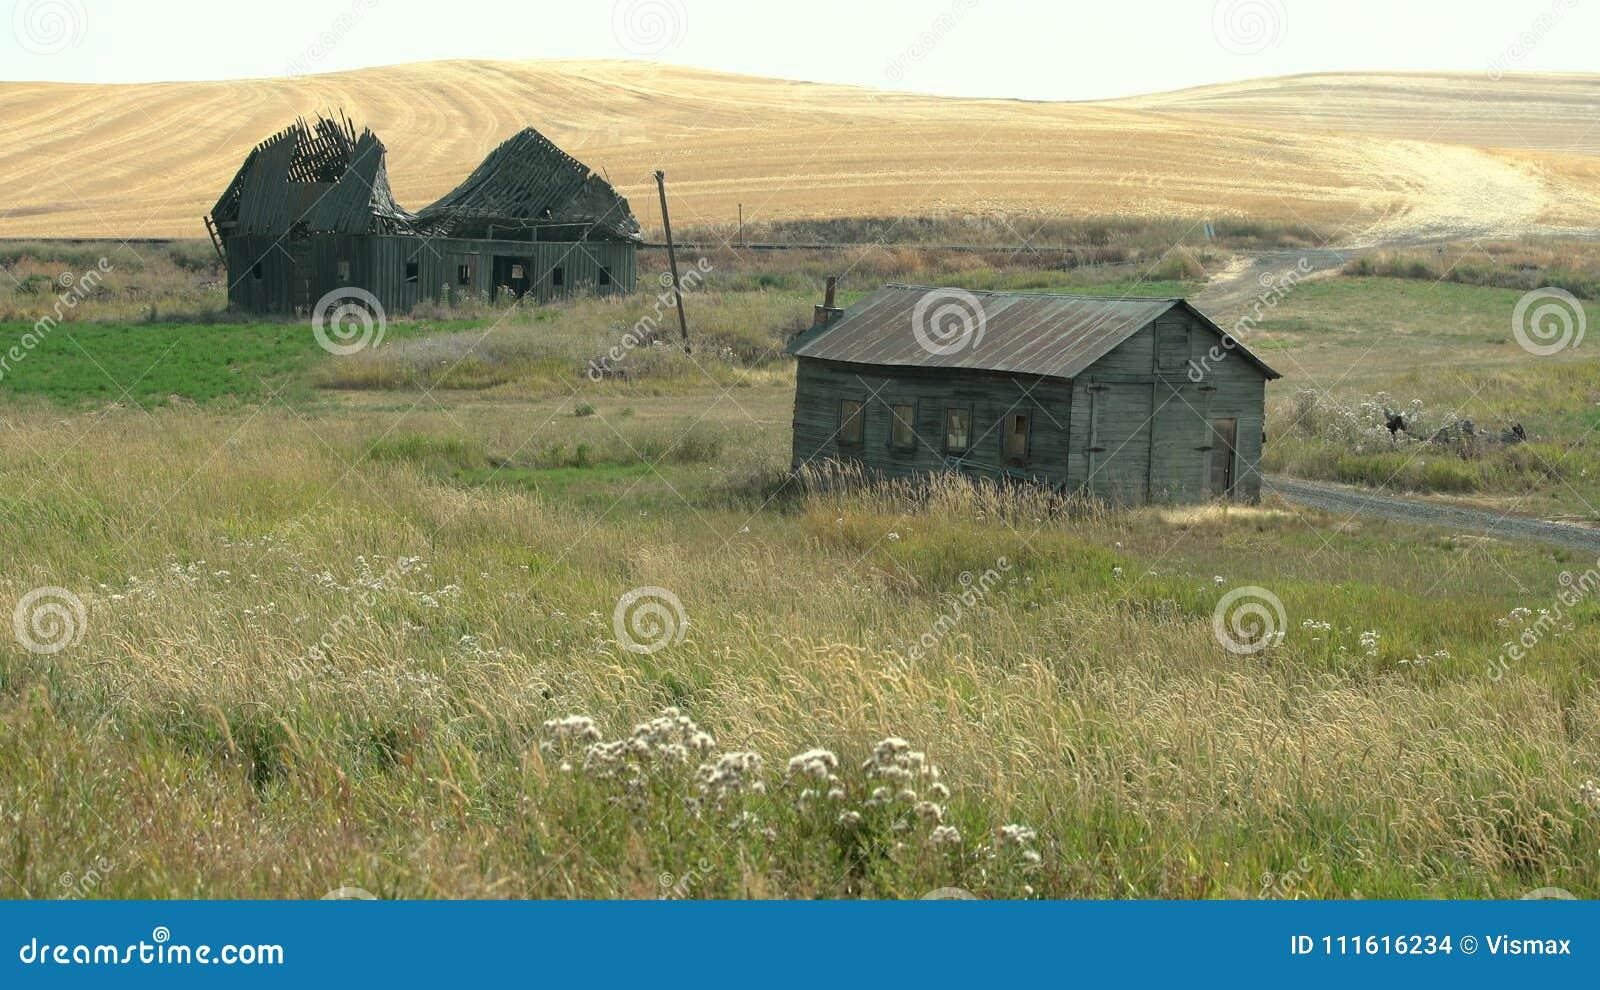 Abandoned Farm Buildings Palouse Washington State 4k Uhd